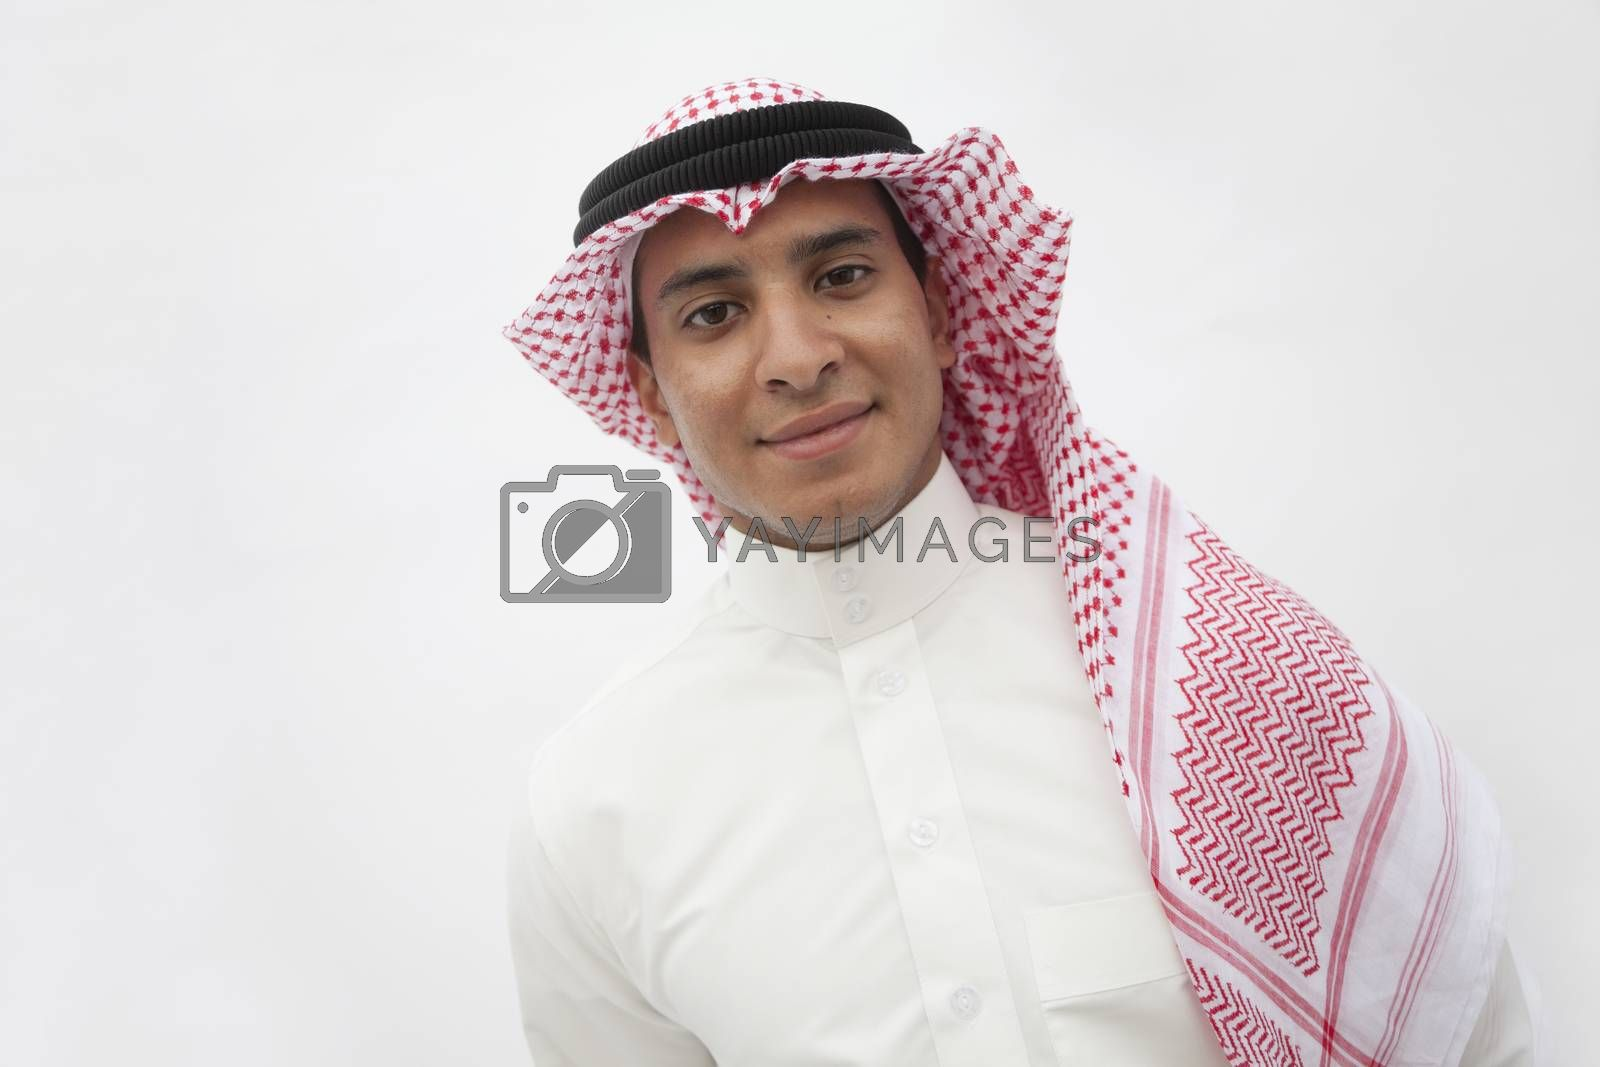 Portrait of smiling teenage boy in traditional Arab clothing, studio shot